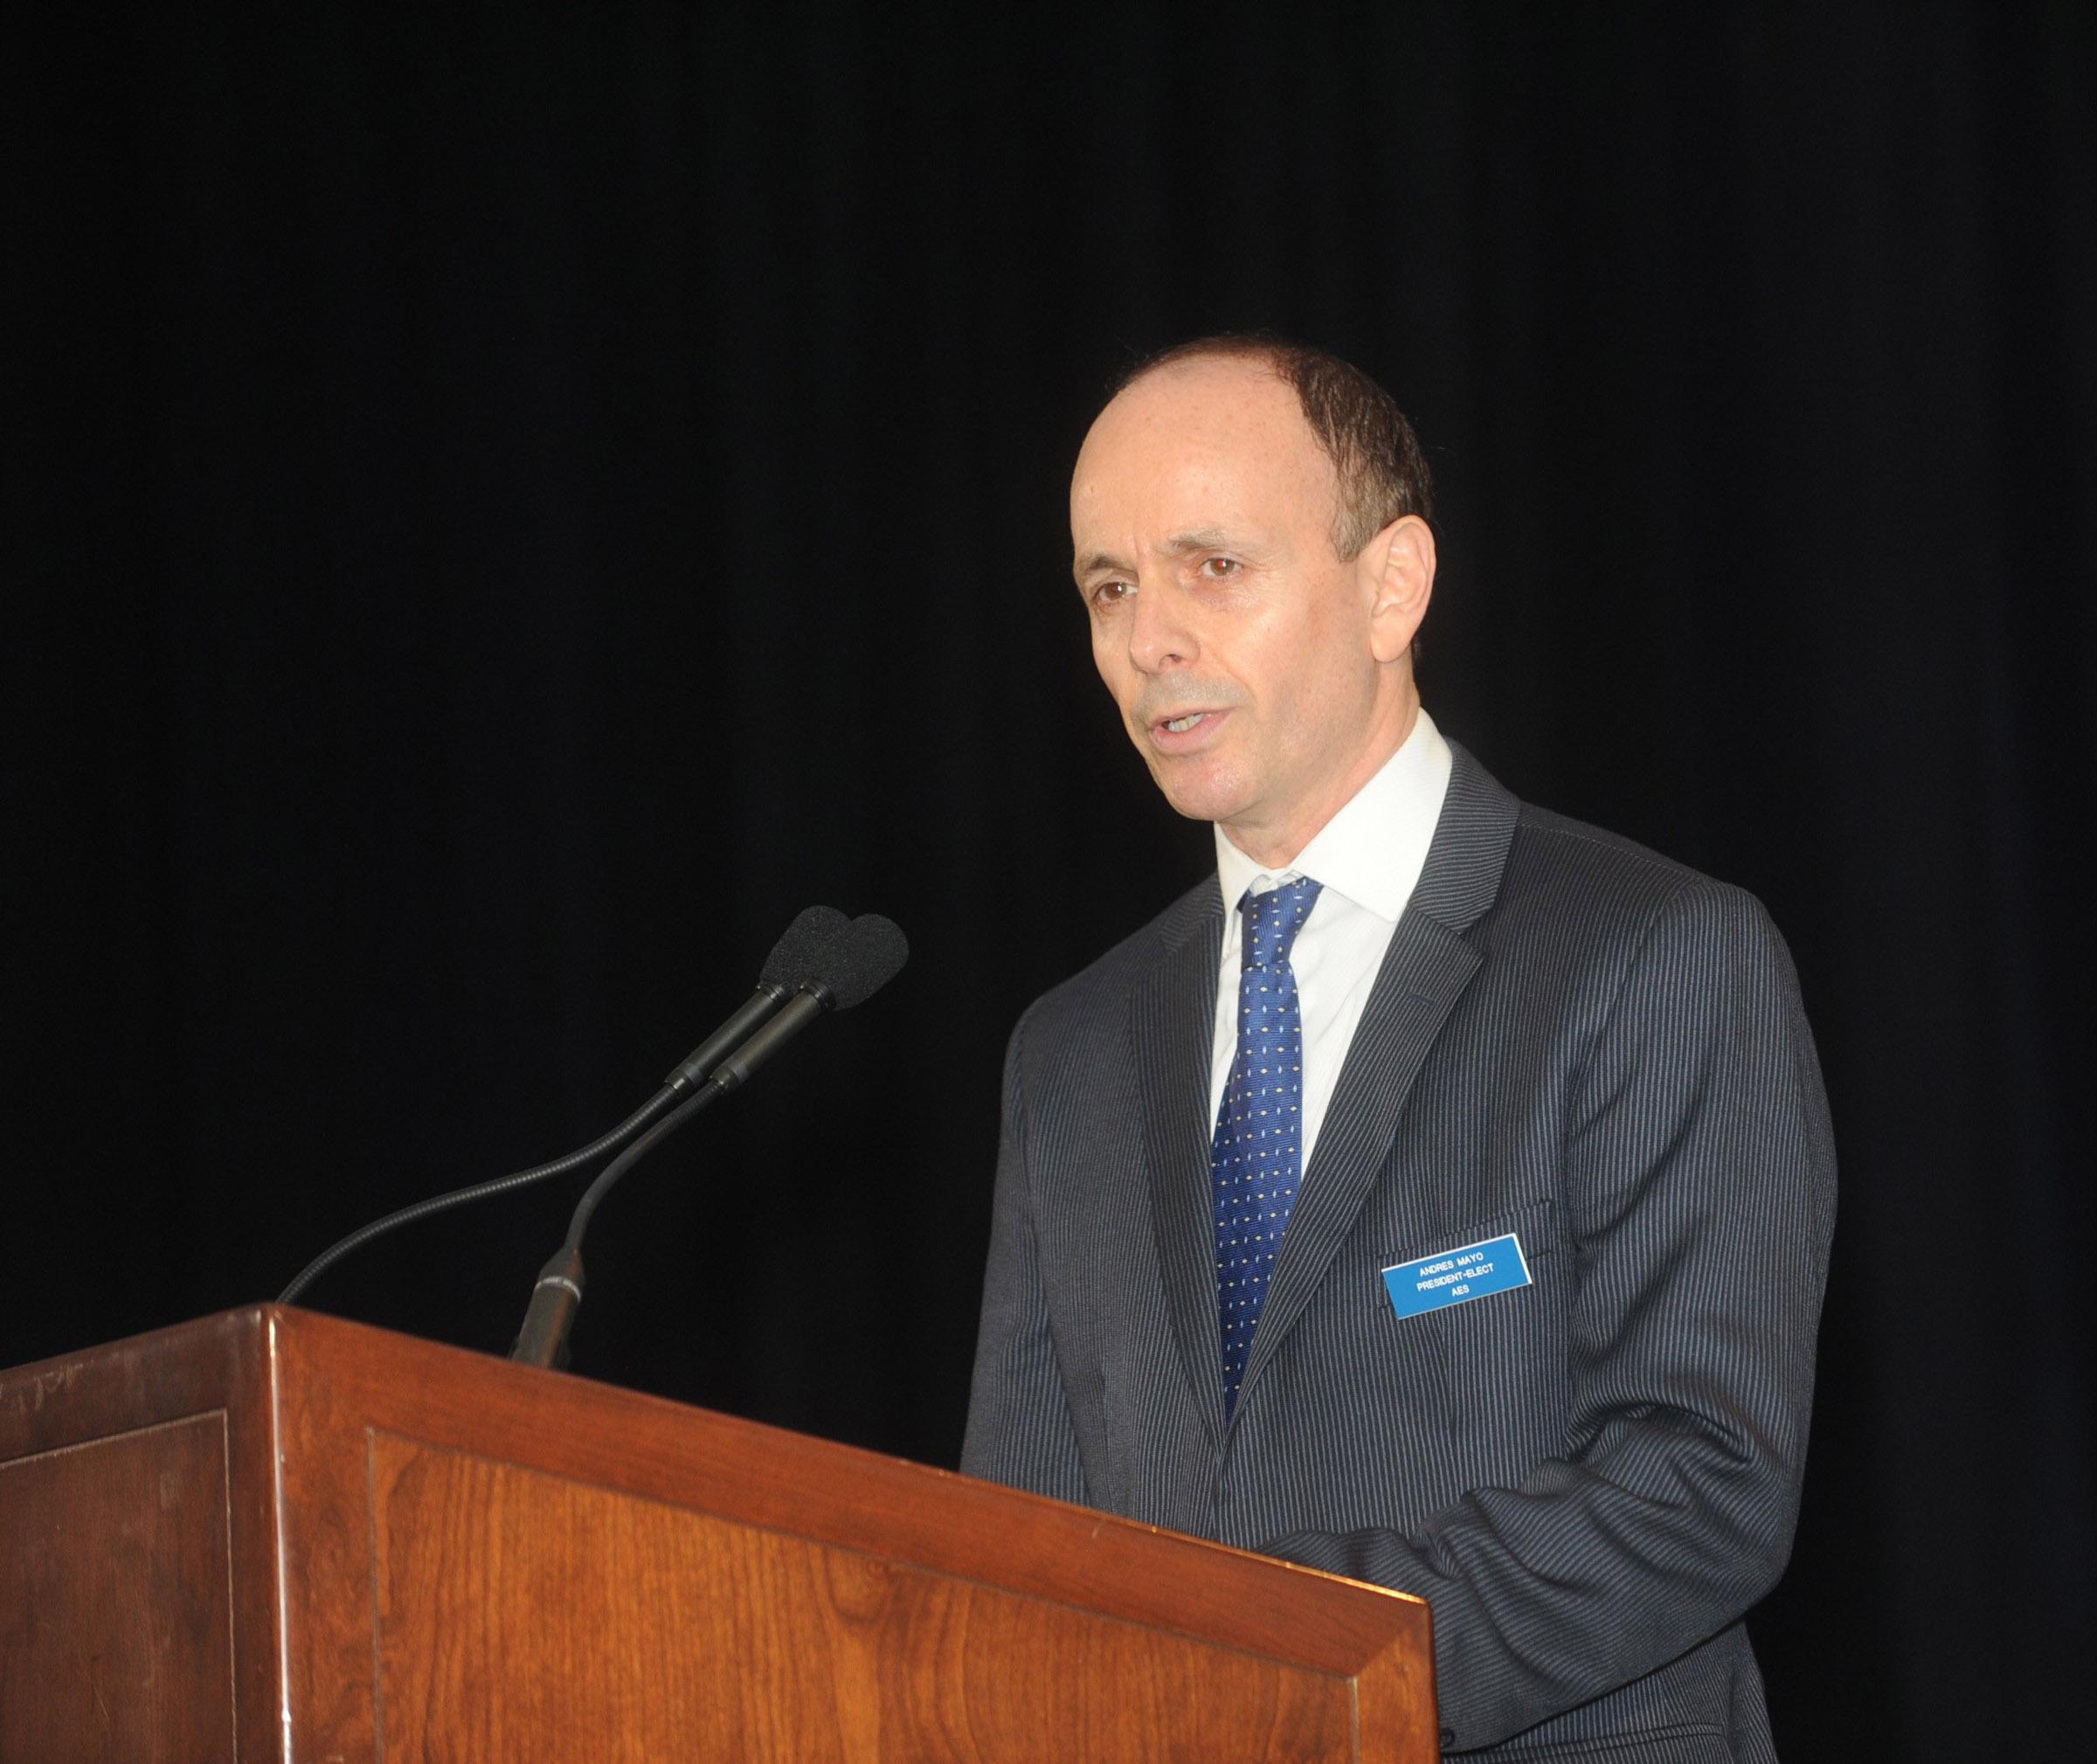 http://www.clynemedia.com/AES/AndresMayo_President/Andres_Mayo.JPG